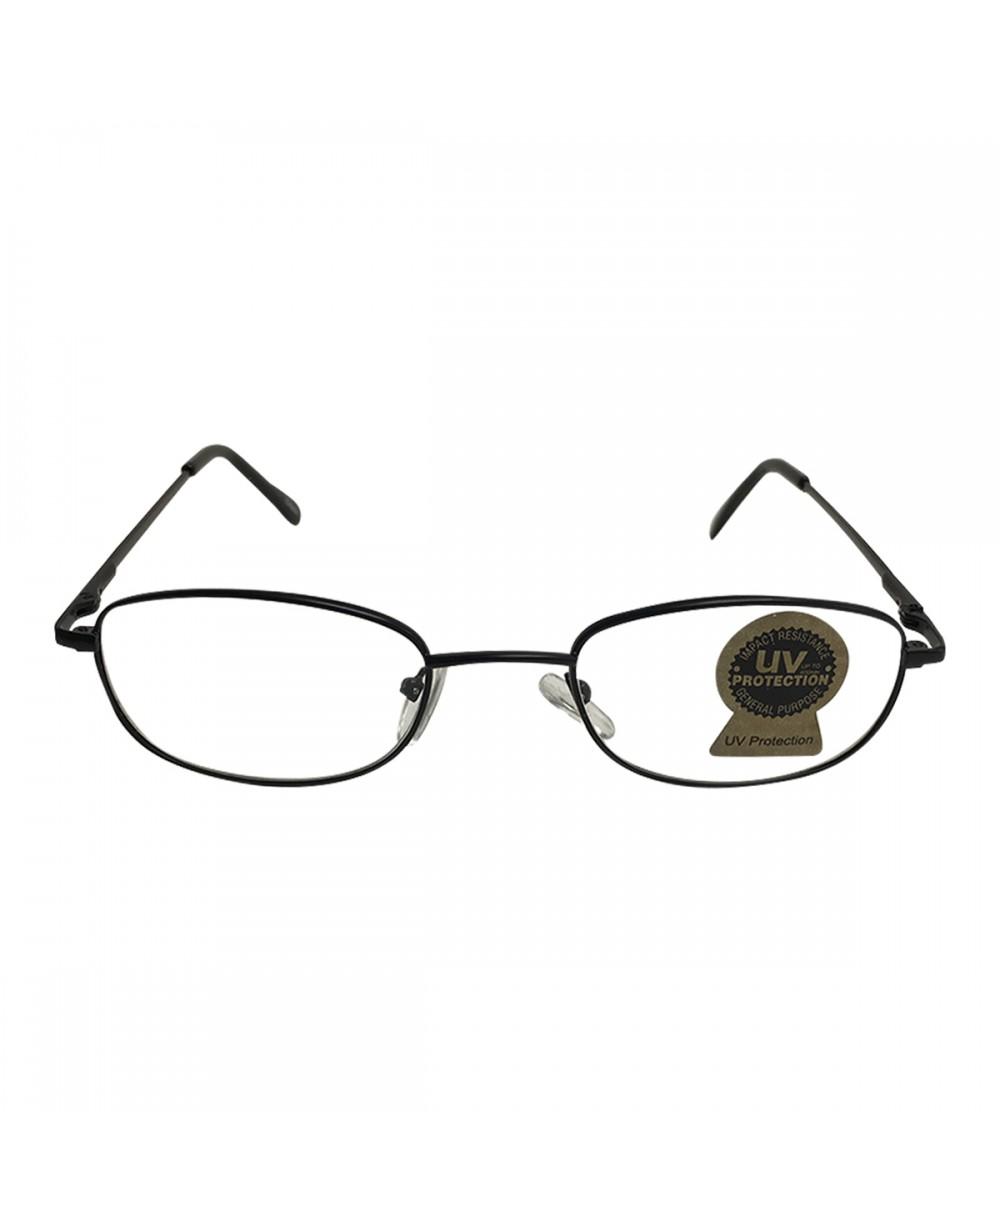 9749384e3b5 More Views. Black Ben Franklin Glasses